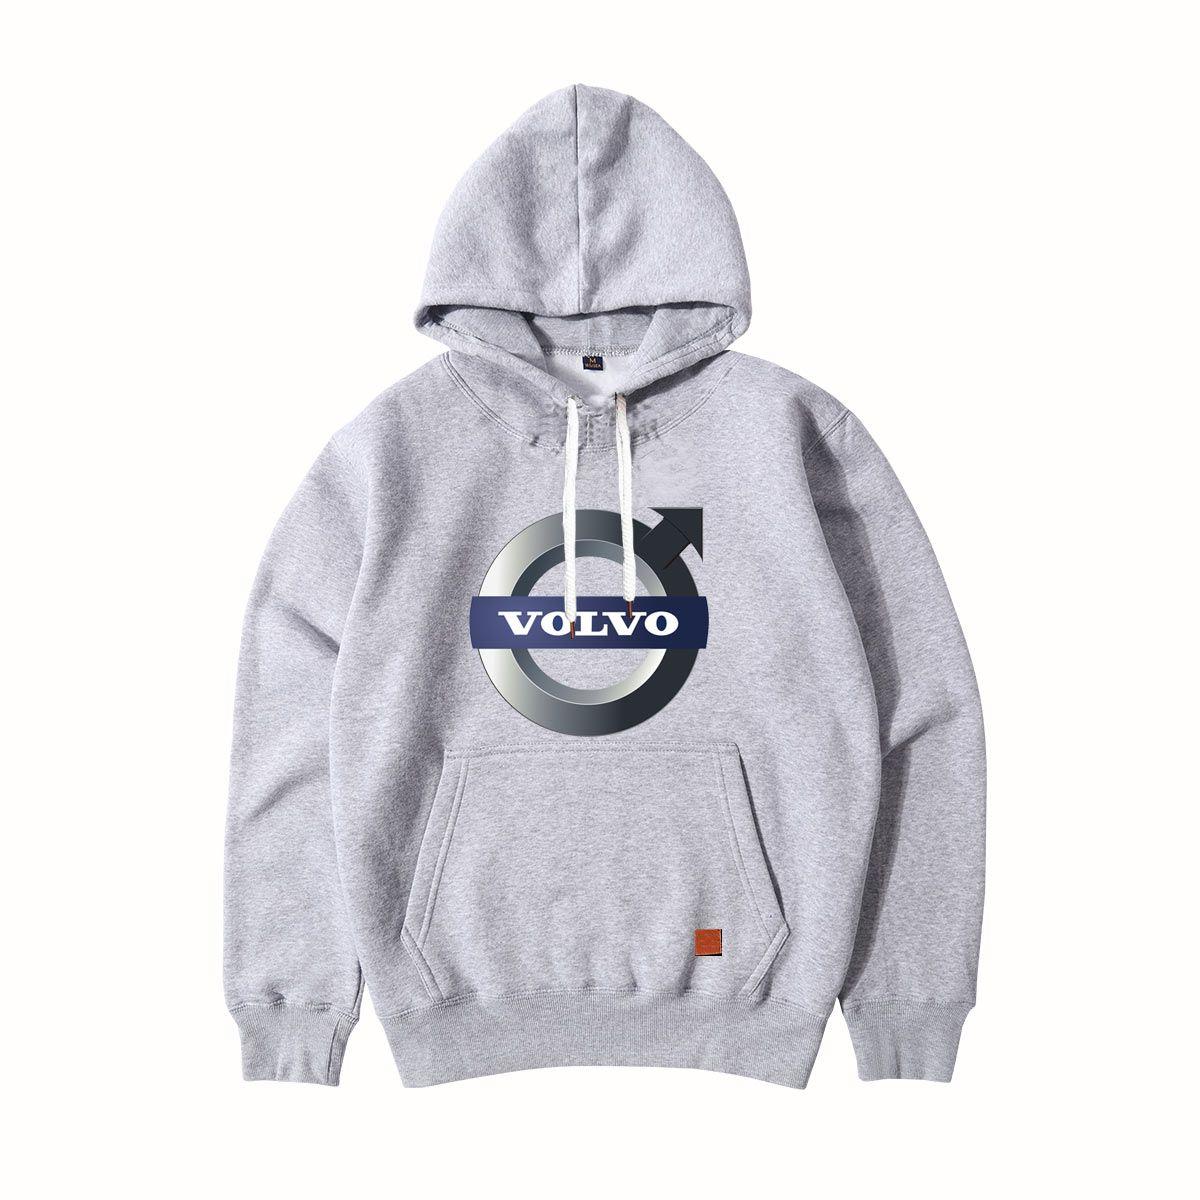 8f296cff 2019 Men Sportswear Fashion Volvo Brand Cars Logo Hoodies Pullover Hip Hop  Male Spring Autumn Tracksuit Sweatshirts Streetwear From Tophoodies, ...